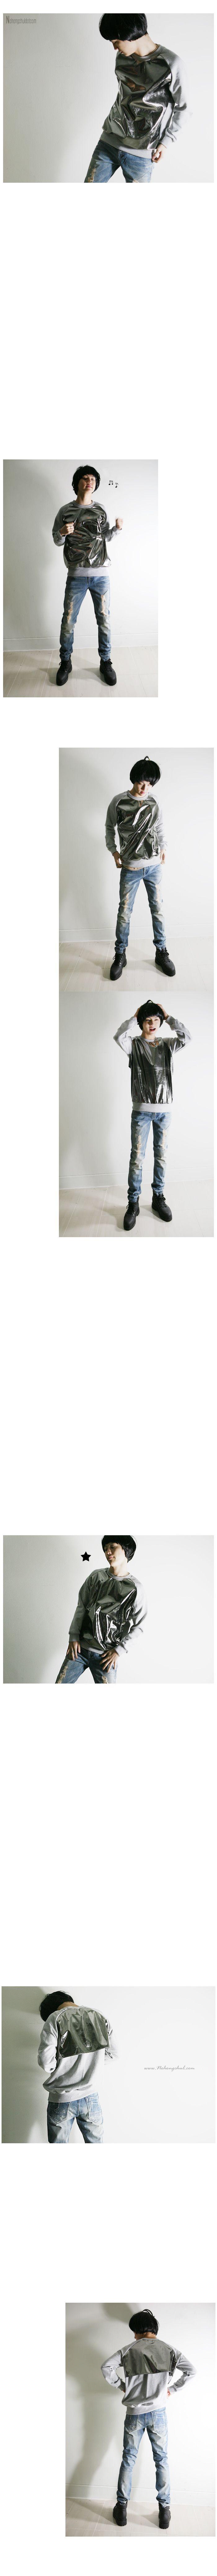 Korea men's fashion mall, Hong Chul style [NOHONGCUL.COM GLOBAL] Cool Water Ice! Jean damage blah / Size : L / Price : 24.51 USD #mensfashion #koreafashion #man #bottom #pants #jeans #KPOP #NOHONGCUL_GLOBAL #OOTD